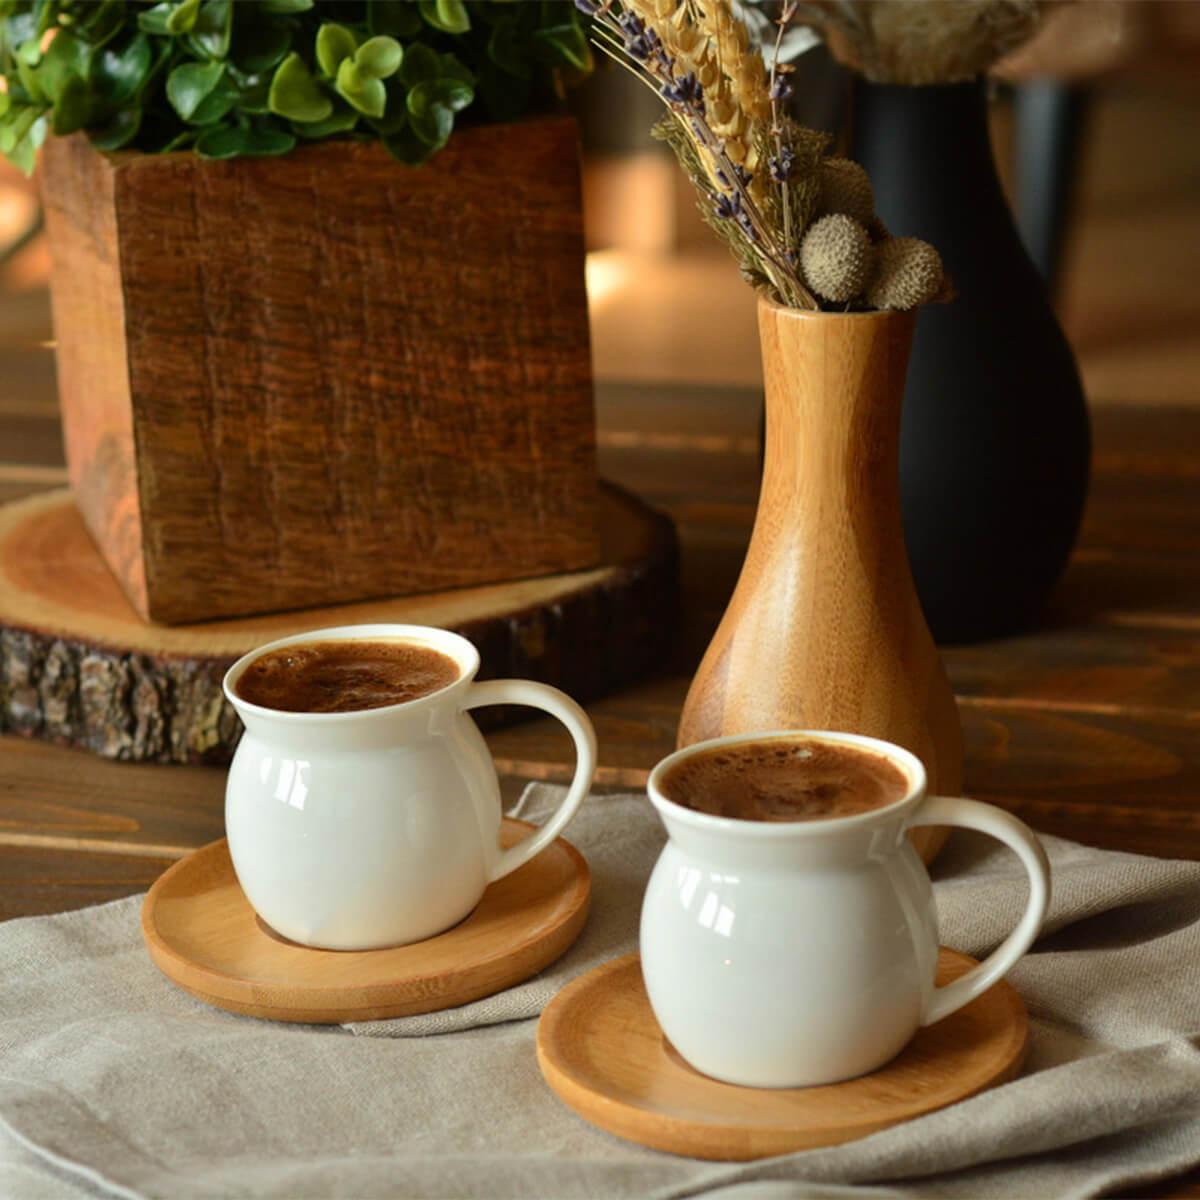 bambu-turk-kahvesi-fincan-takimi